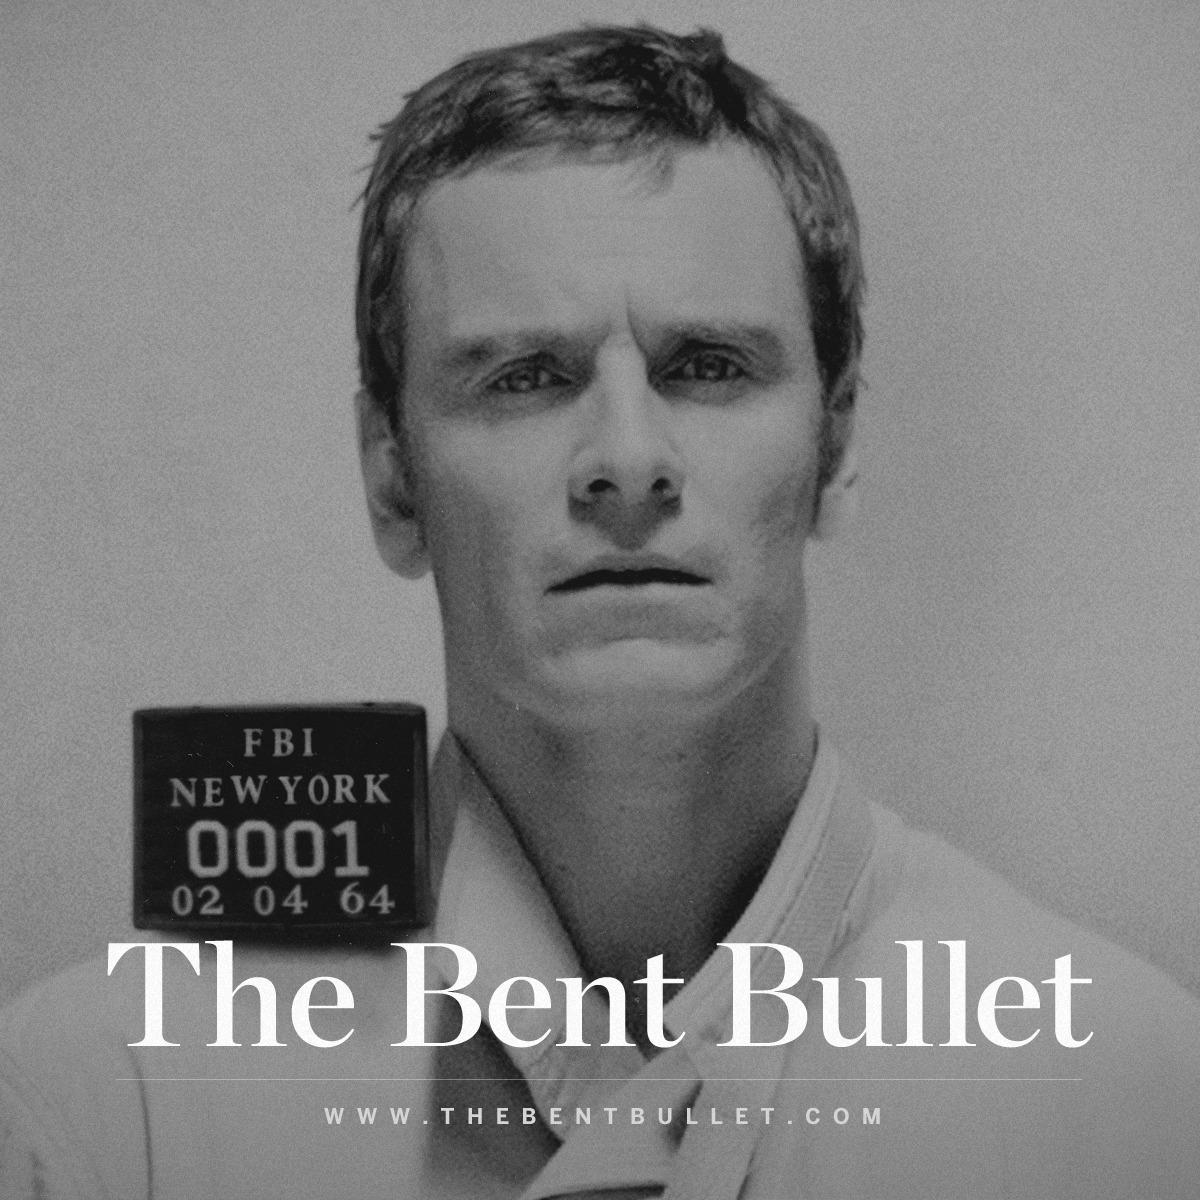 The Bent Bullet Report